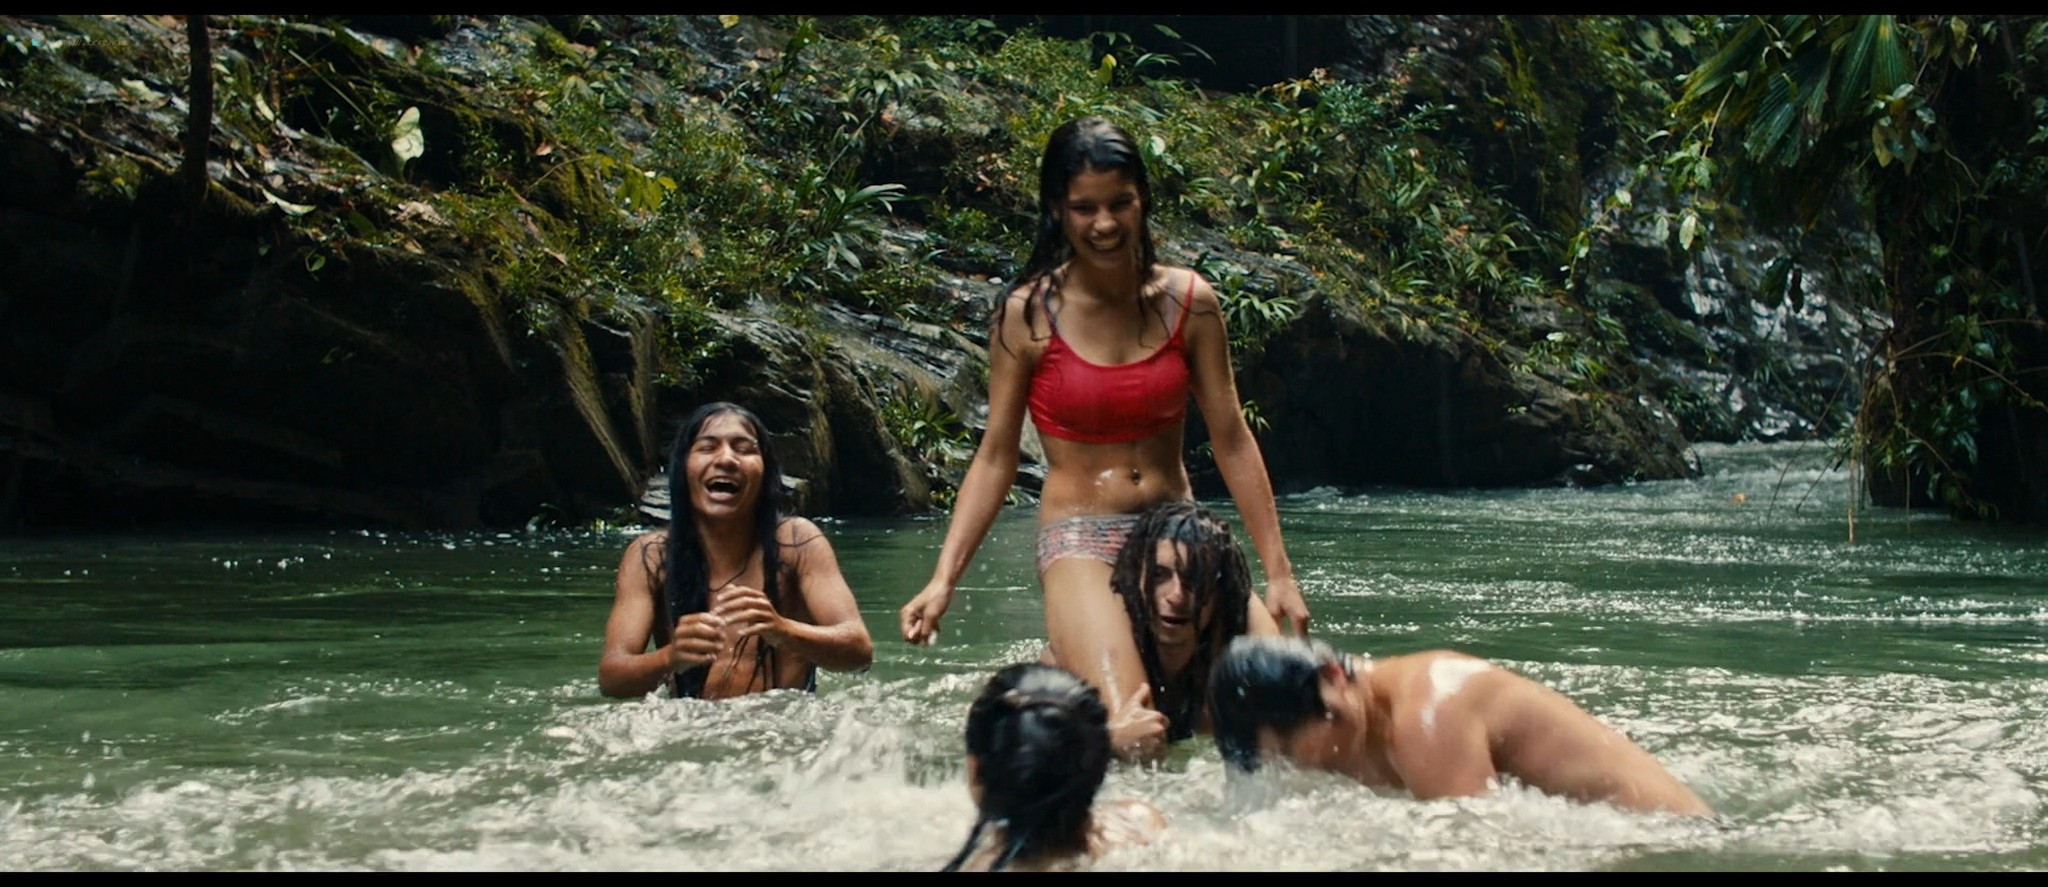 Julianne Nicholson pokies Karen Quintero, Laura Castrillón sexy - Monos (2019) HD 1080p BluRay (10)